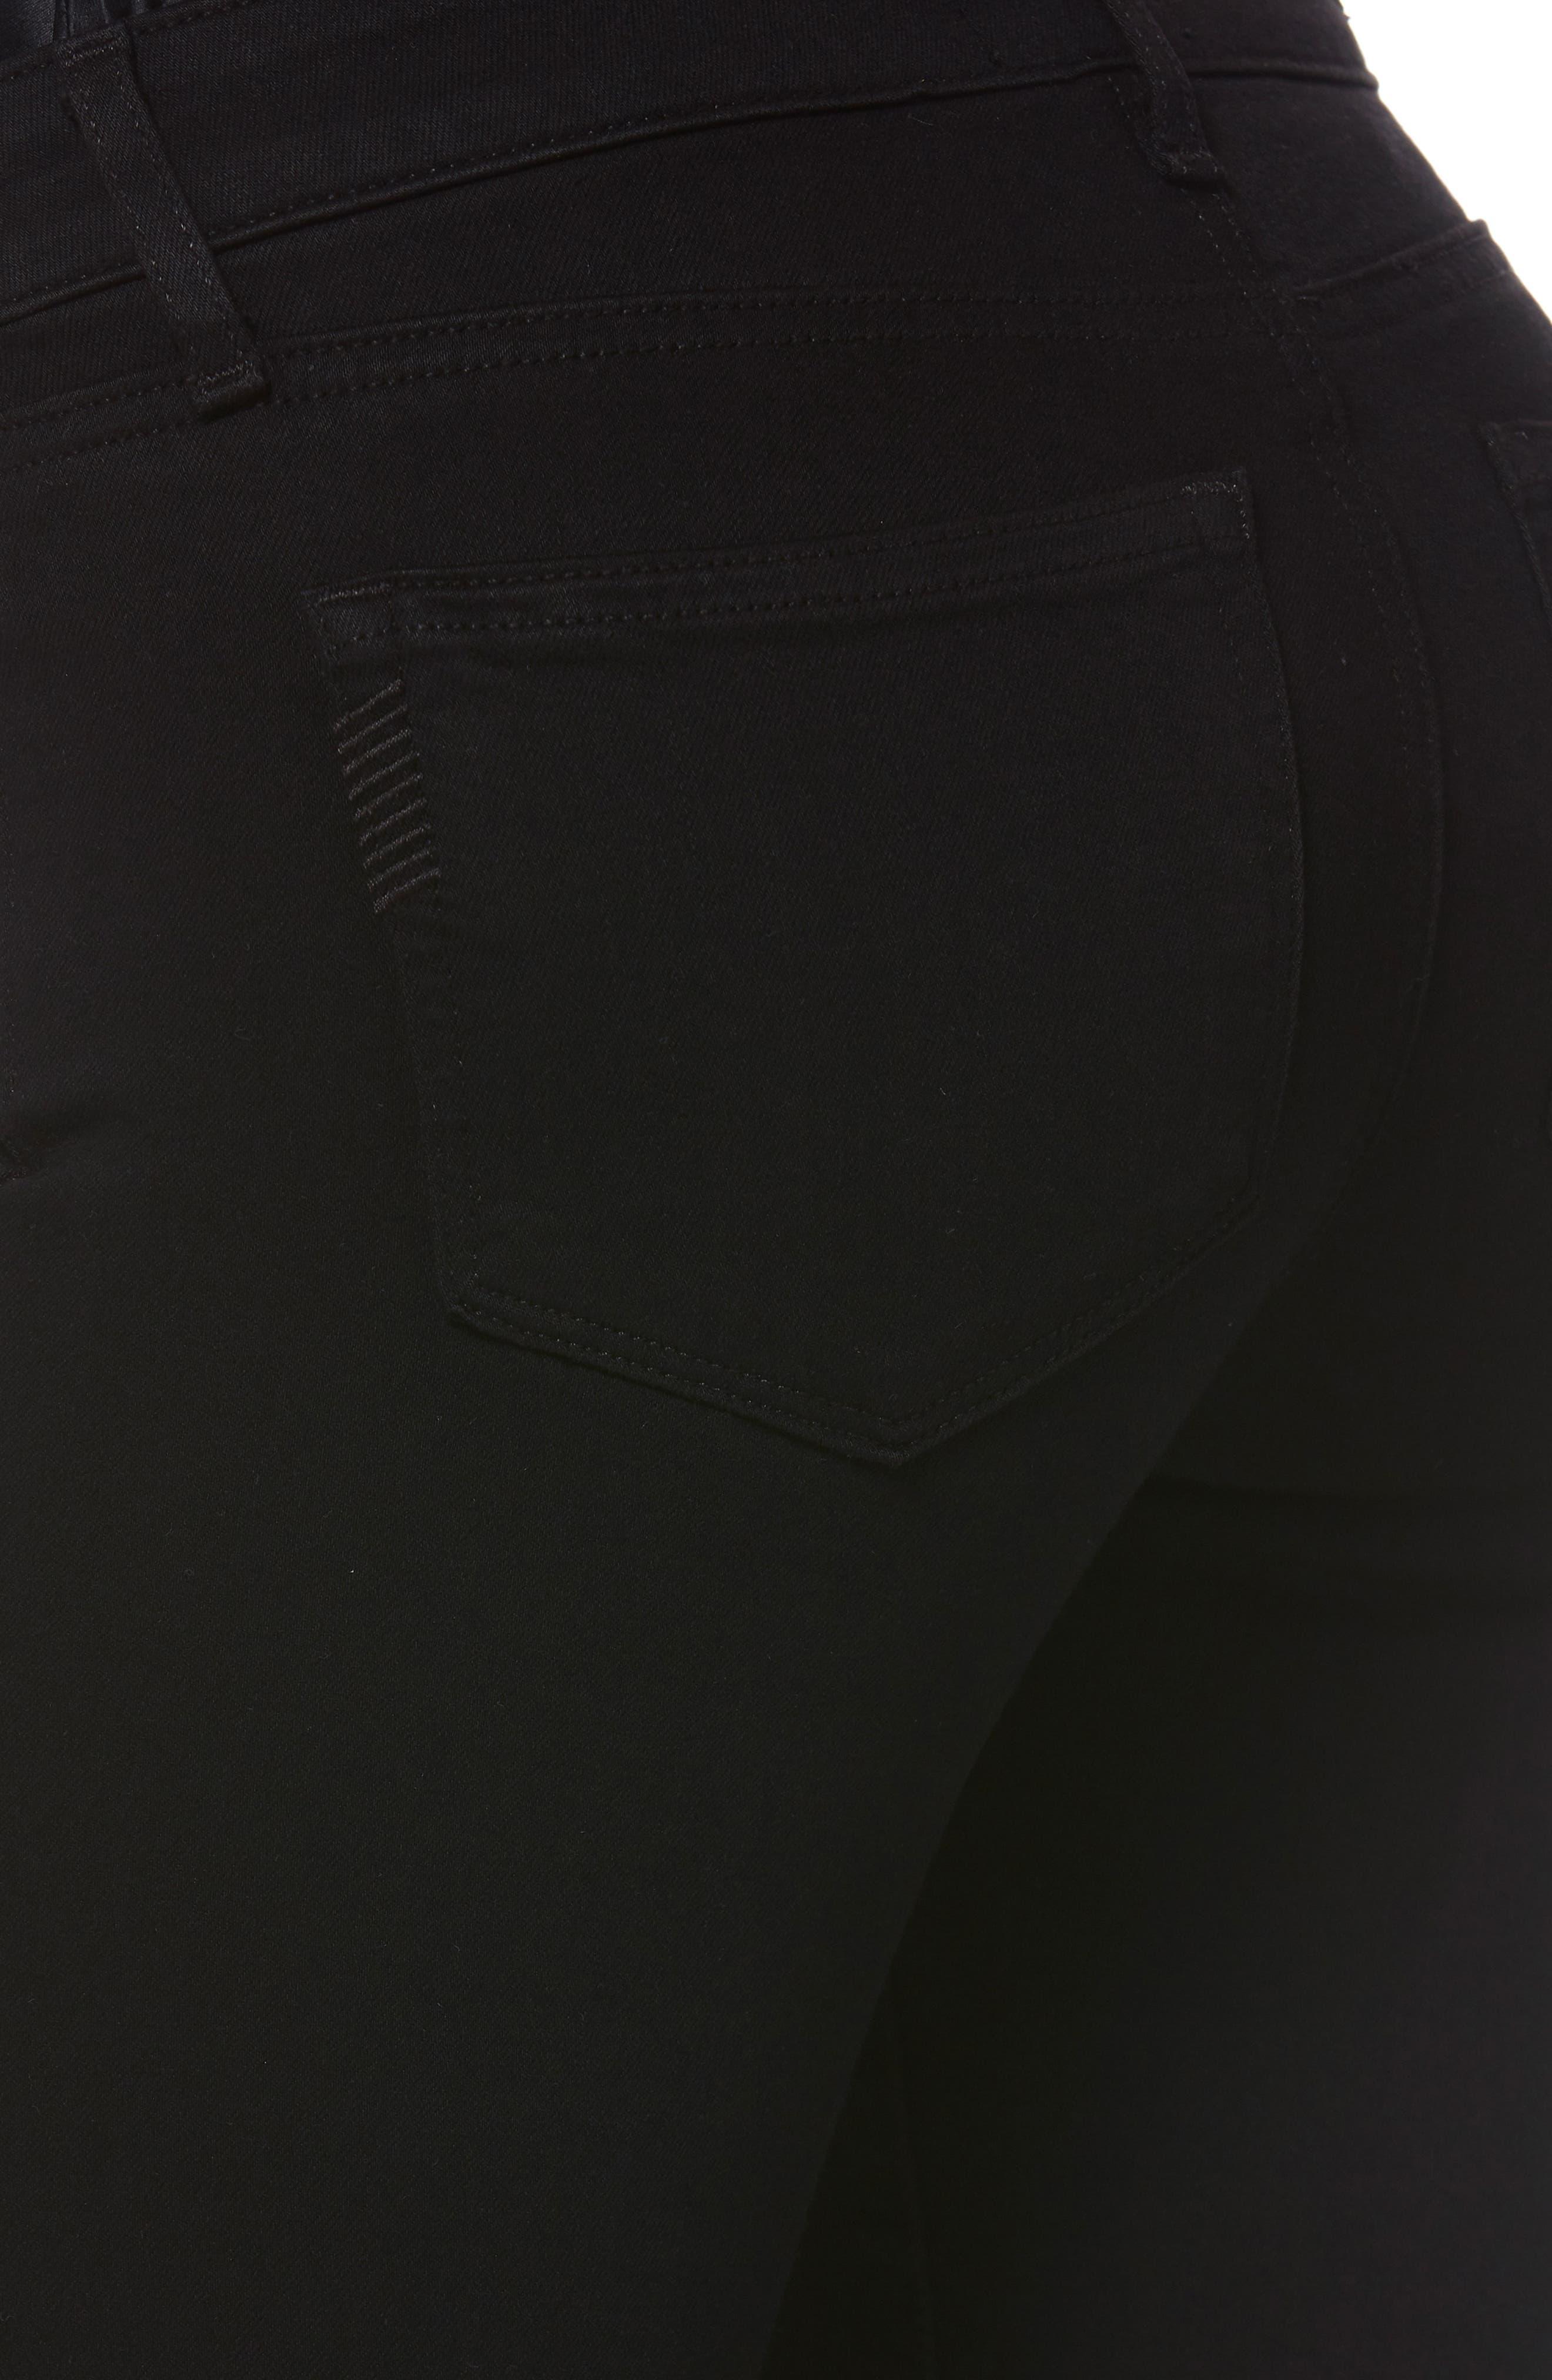 Transcend - Skyline Skinny Jeans,                             Alternate thumbnail 7, color,                             BLACK SHADOW